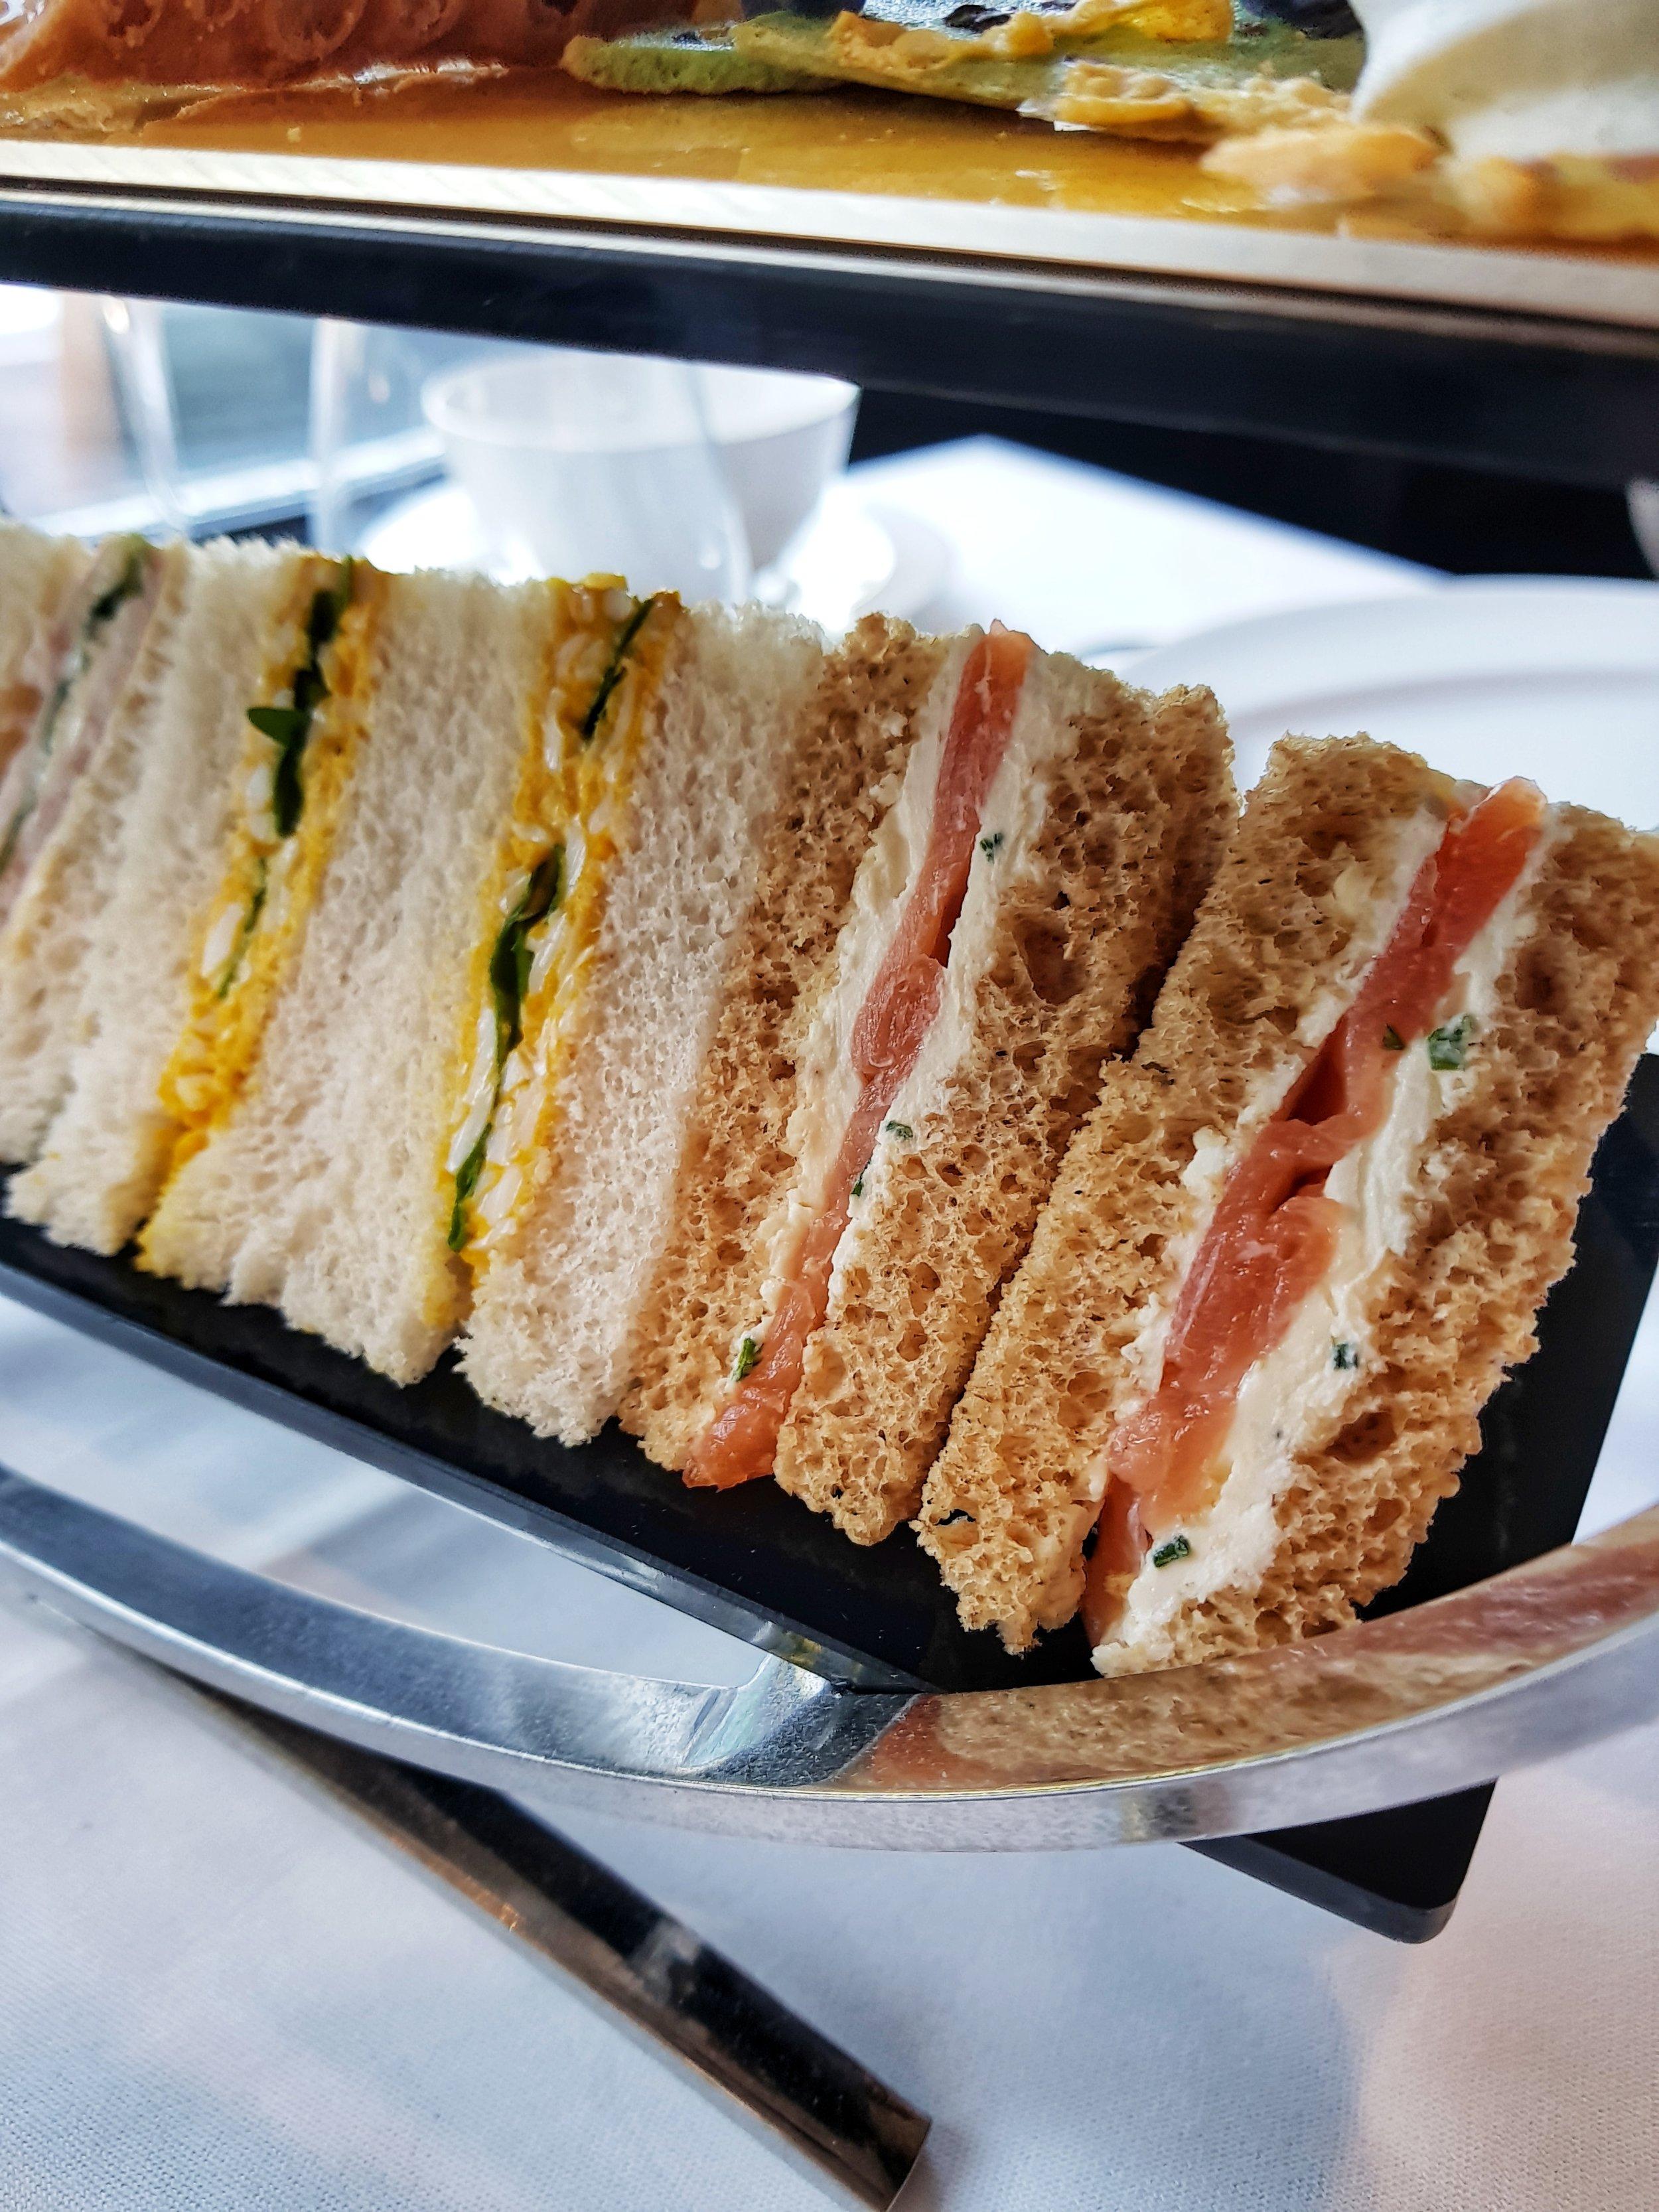 ACQUA DI PARMA AFTERNOON TEA AT BAGLIONI HOTEL REVIEW LONDON